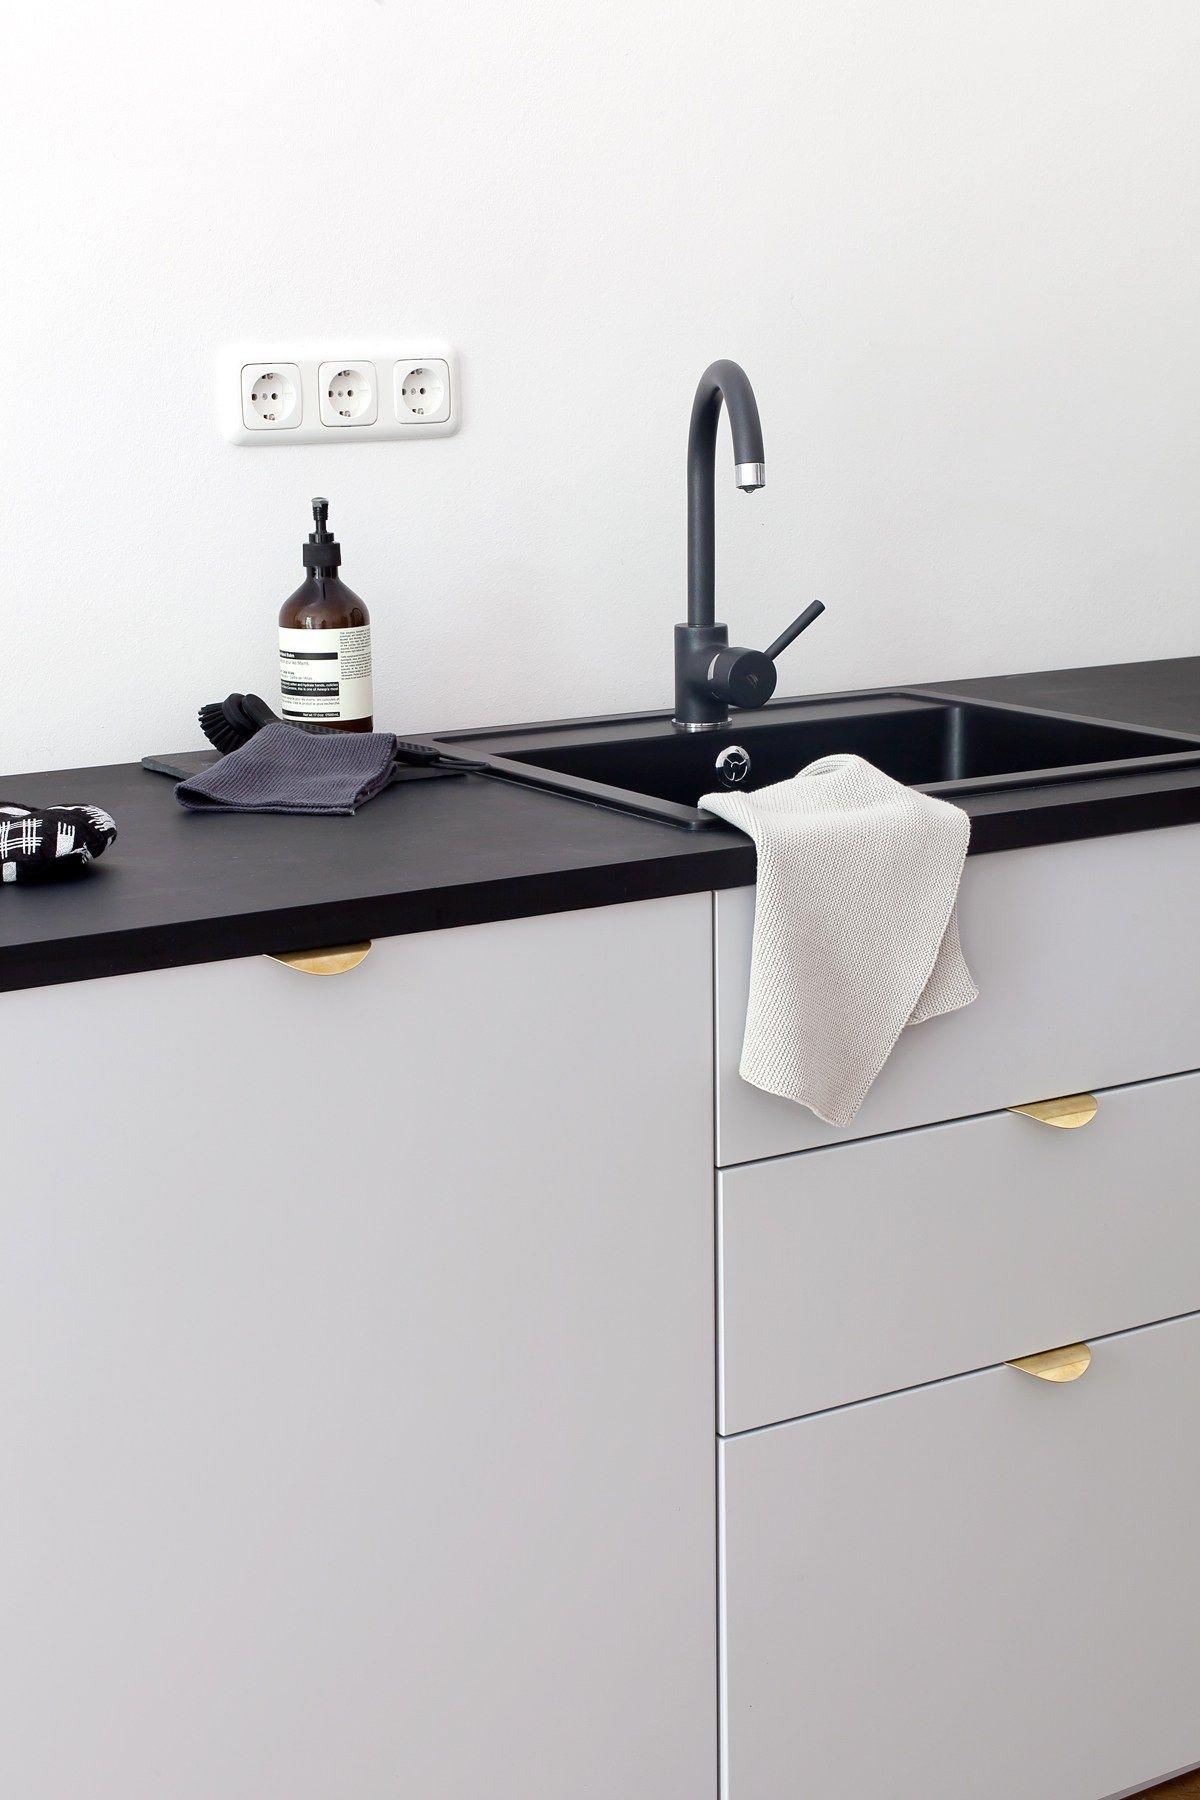 IKEA Veddinge Front grau plus superfront Griffe – schwarze ... | {Armaturen küche ikea 31}